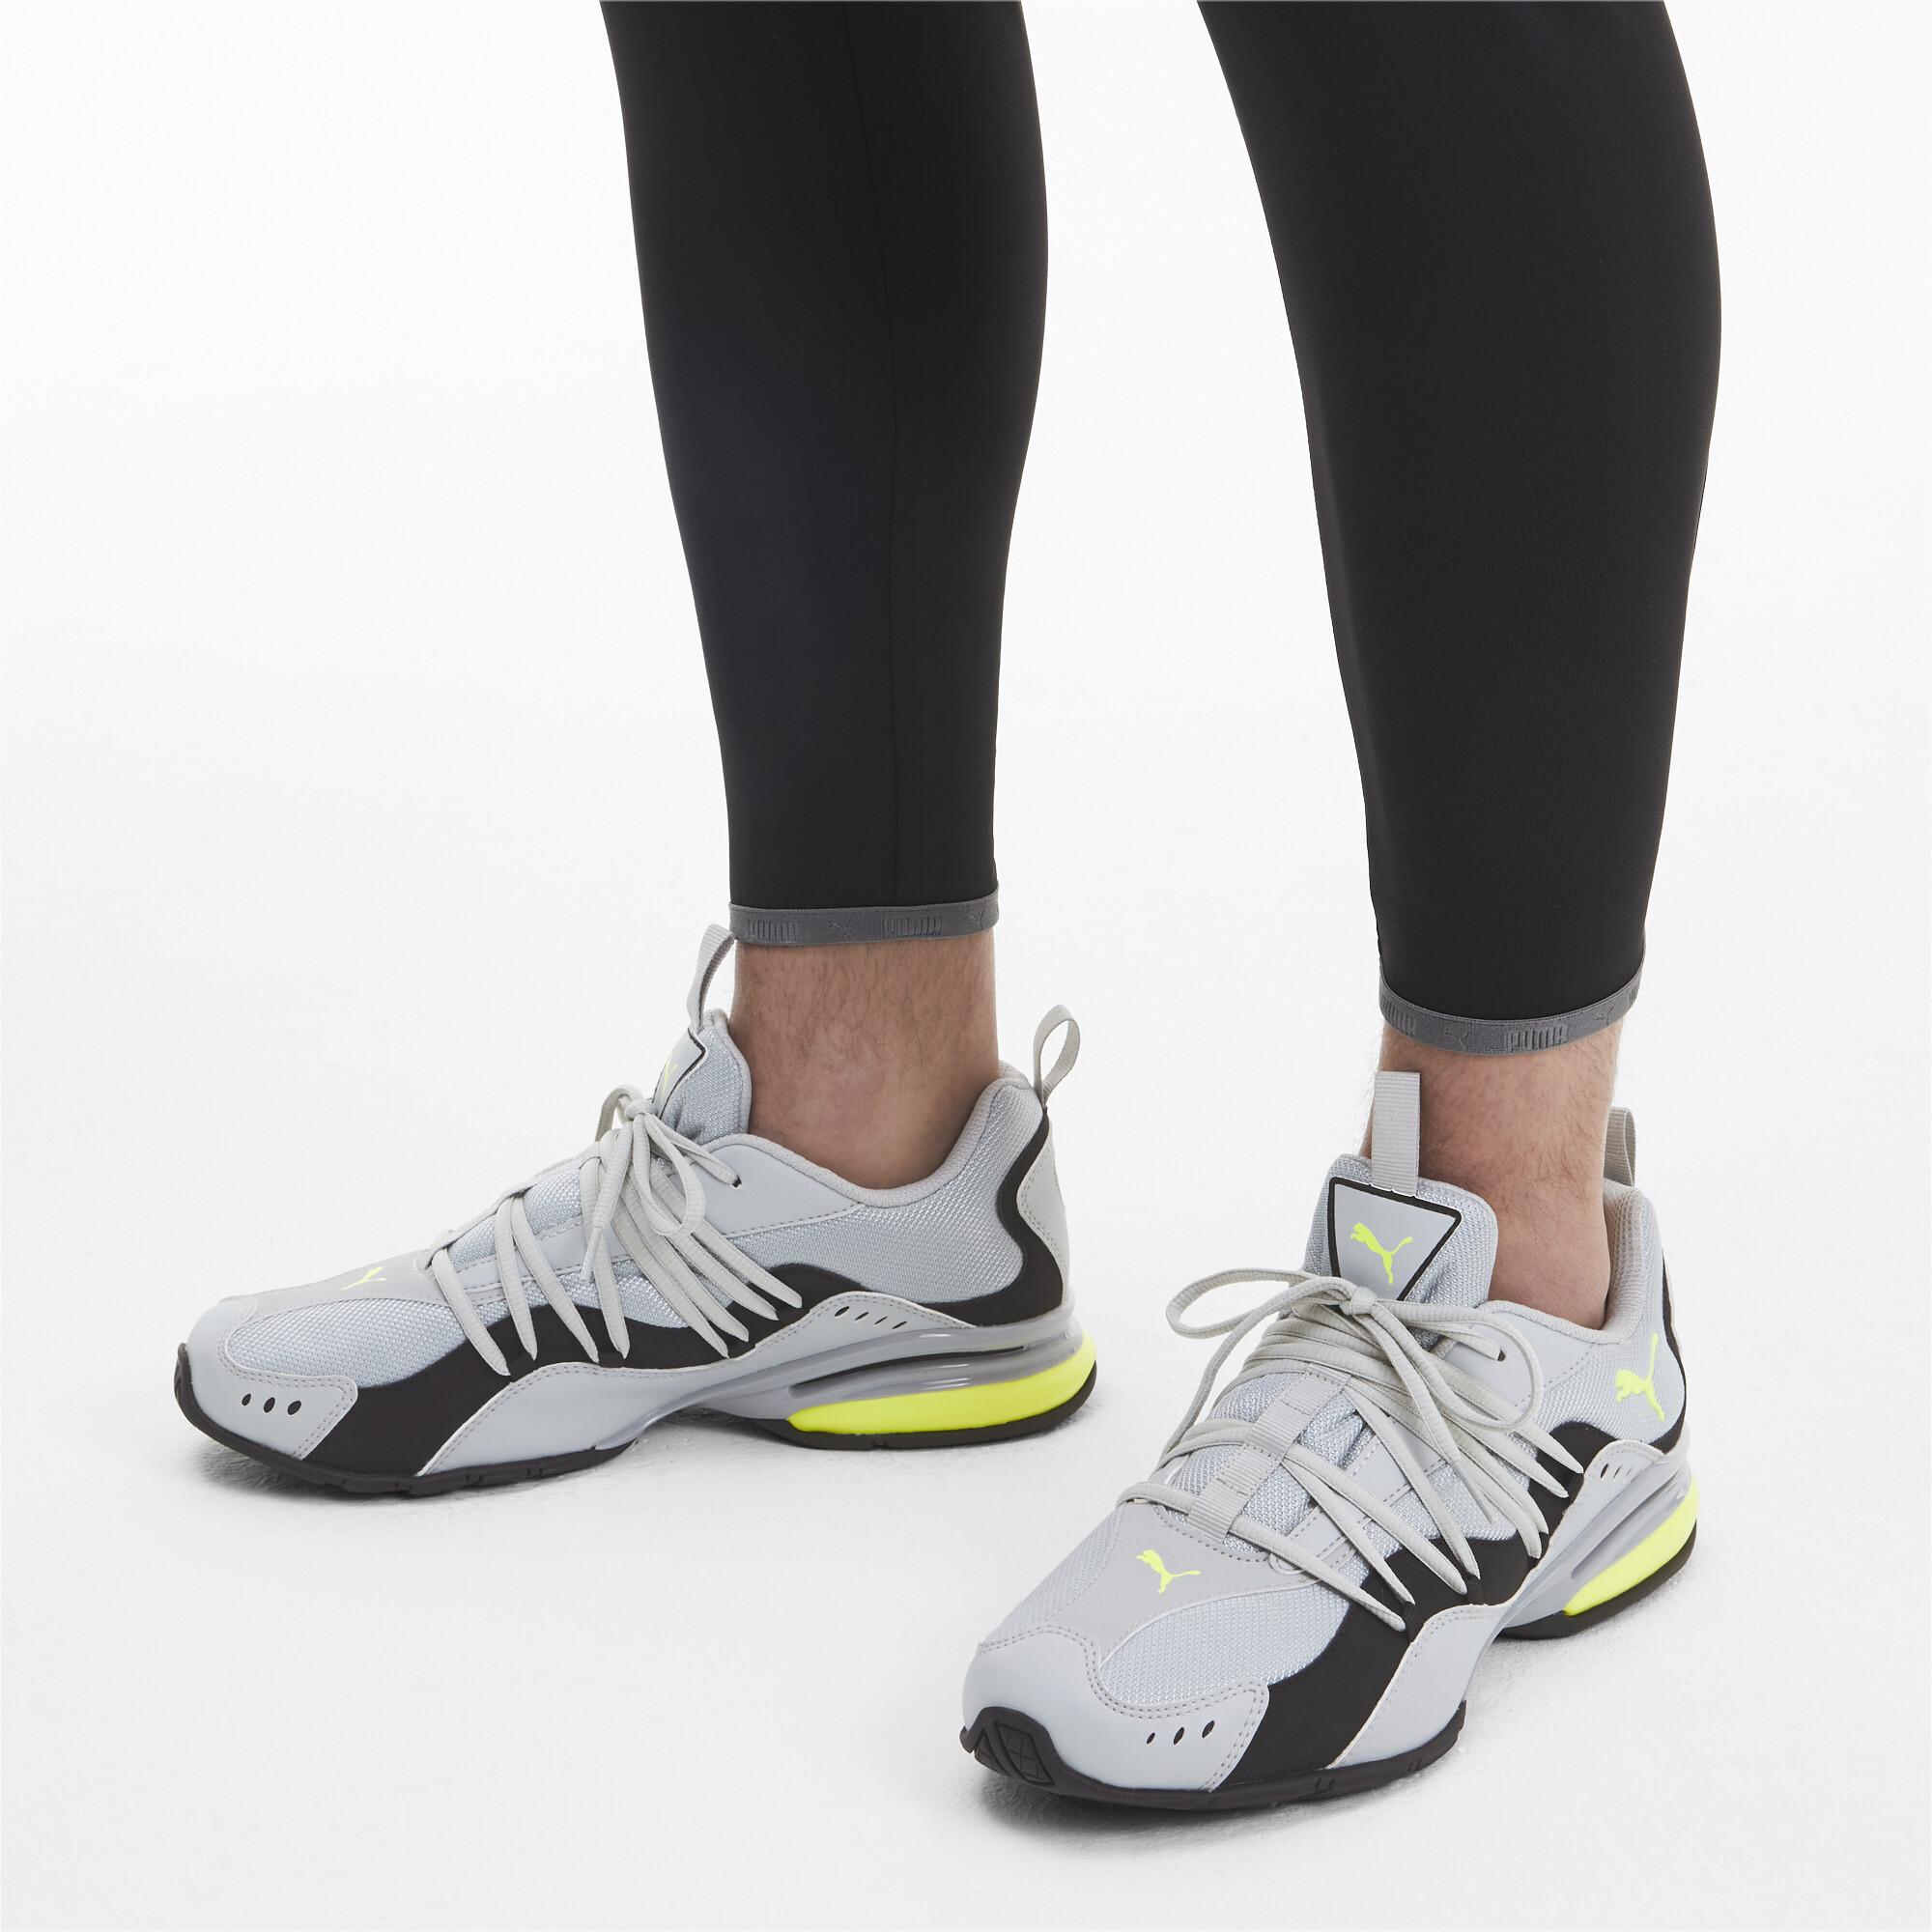 PUMA-Silverion-Men-s-Running-Shoes-Men-Shoe-Running thumbnail 20